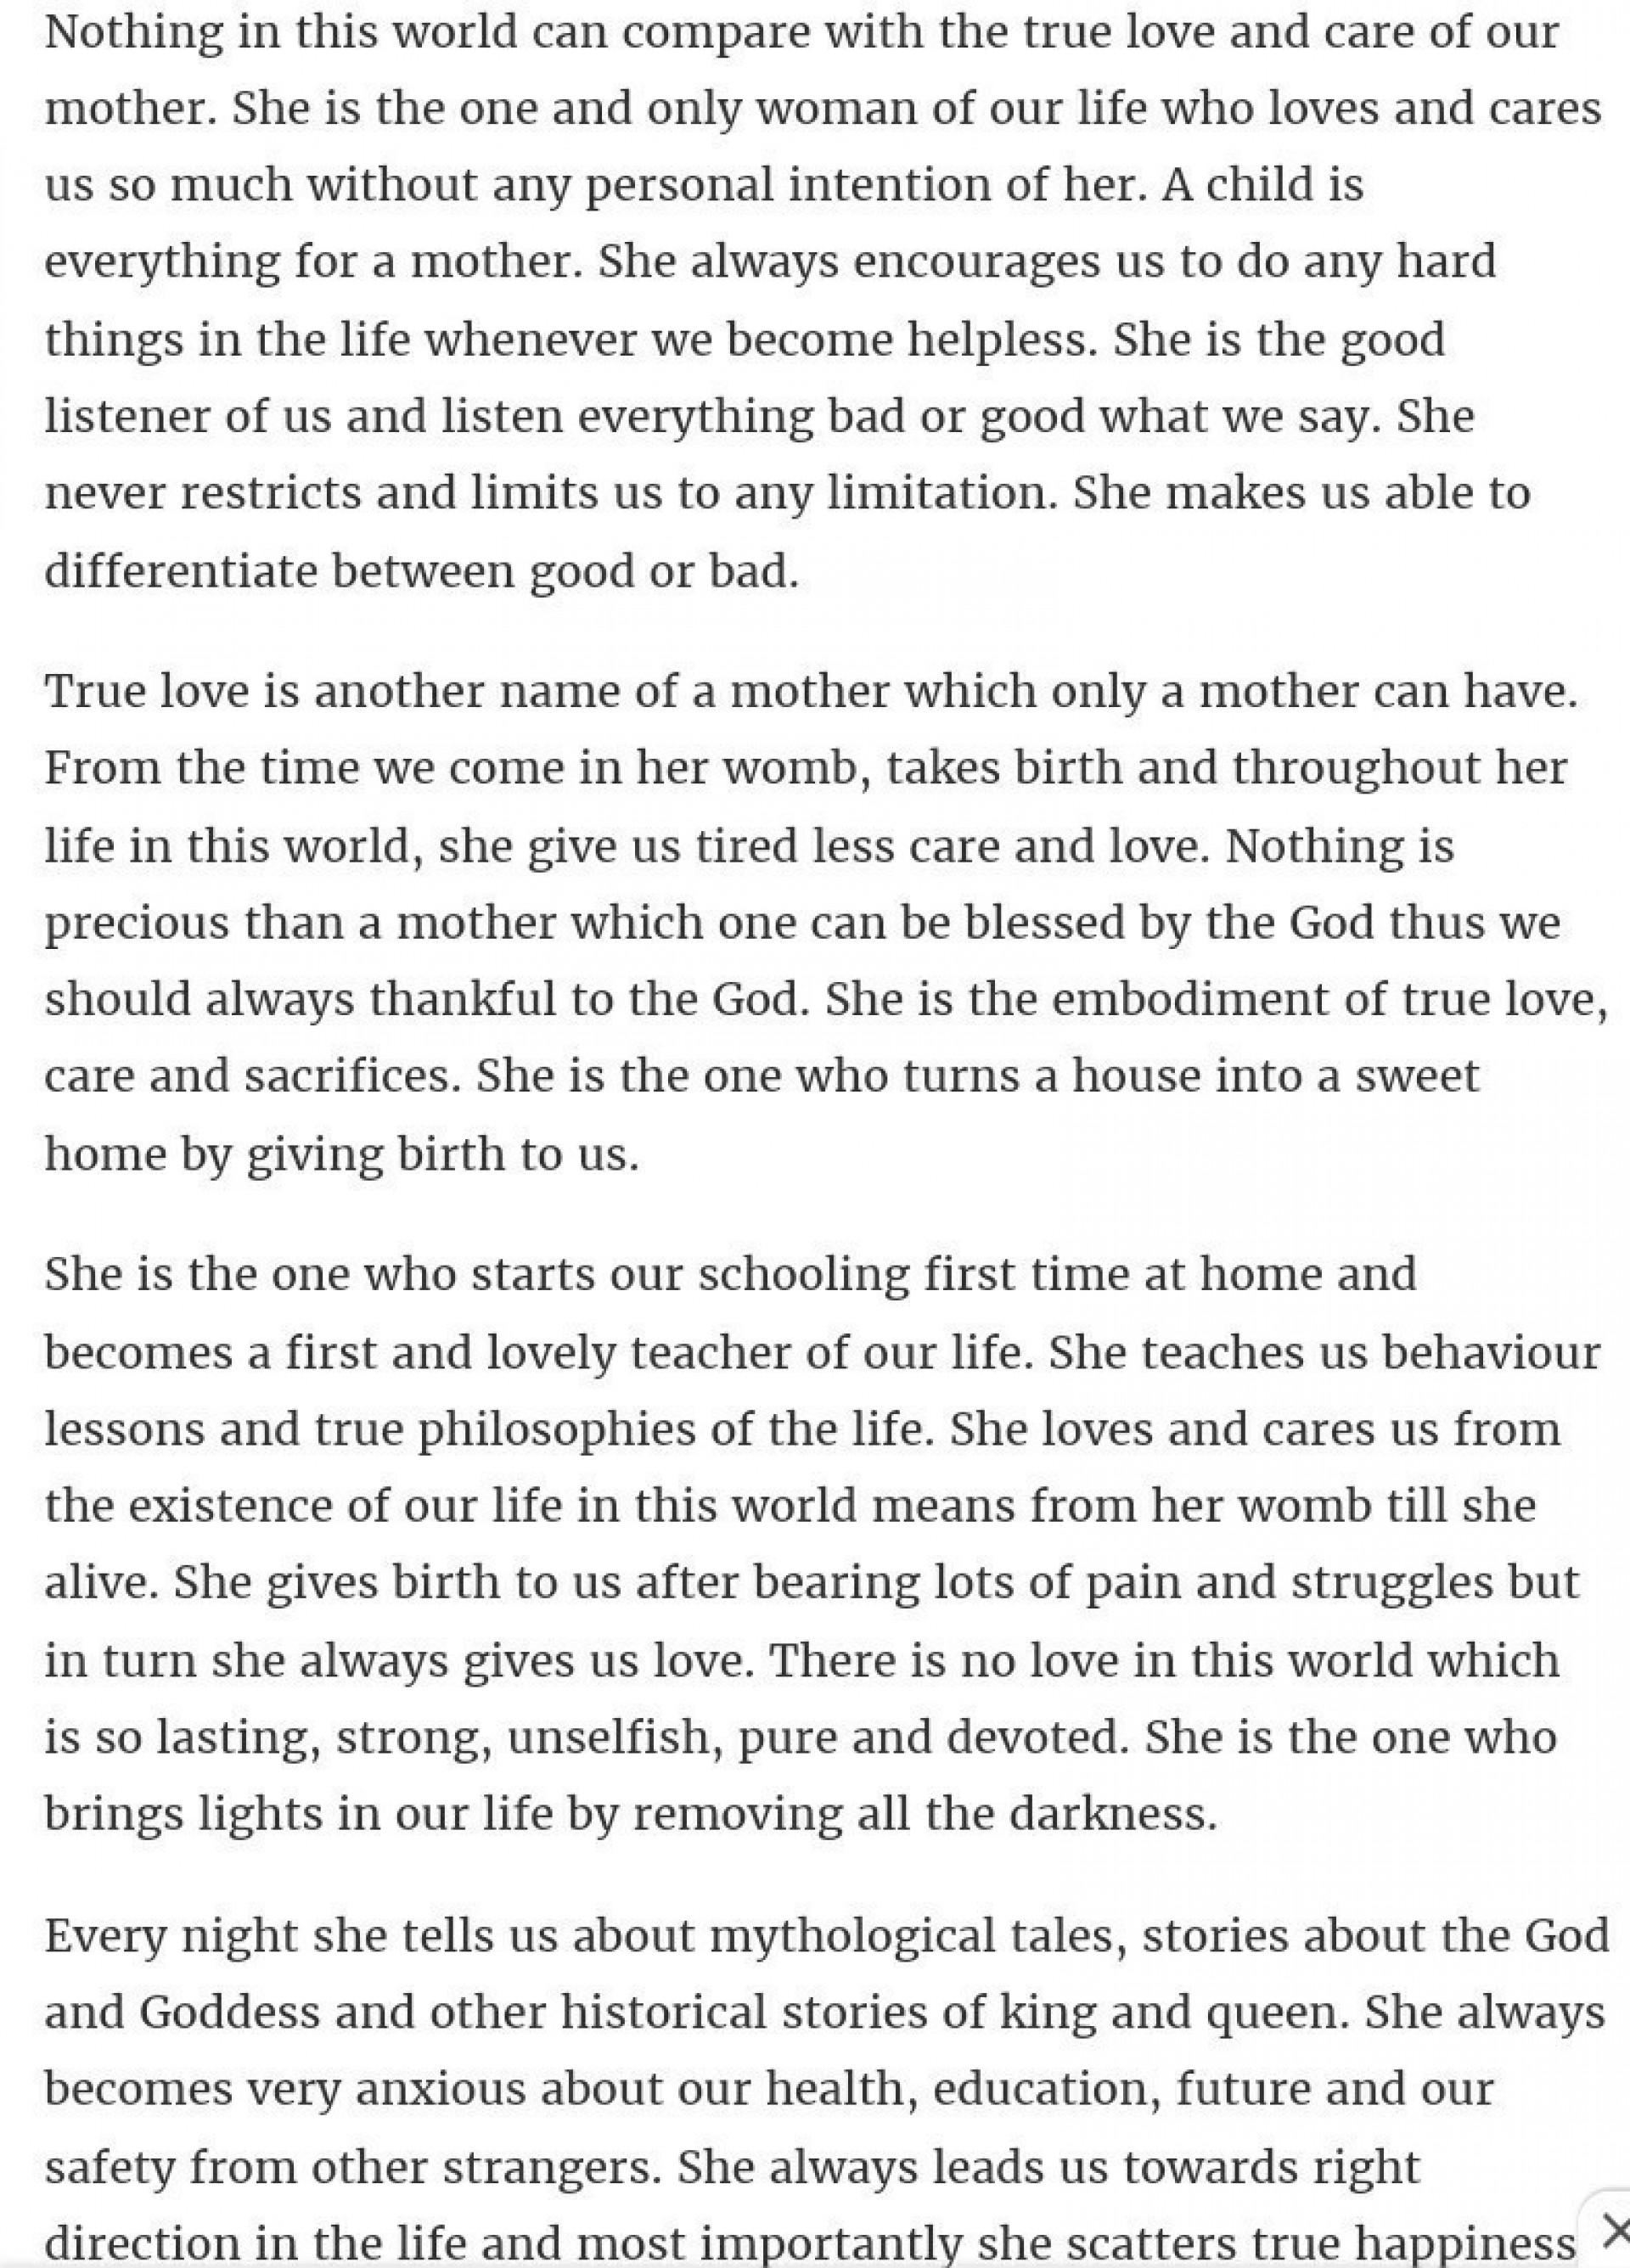 007 Love Essay Unbelievable Is Blind Ideas Shakespeare In Topics 1920